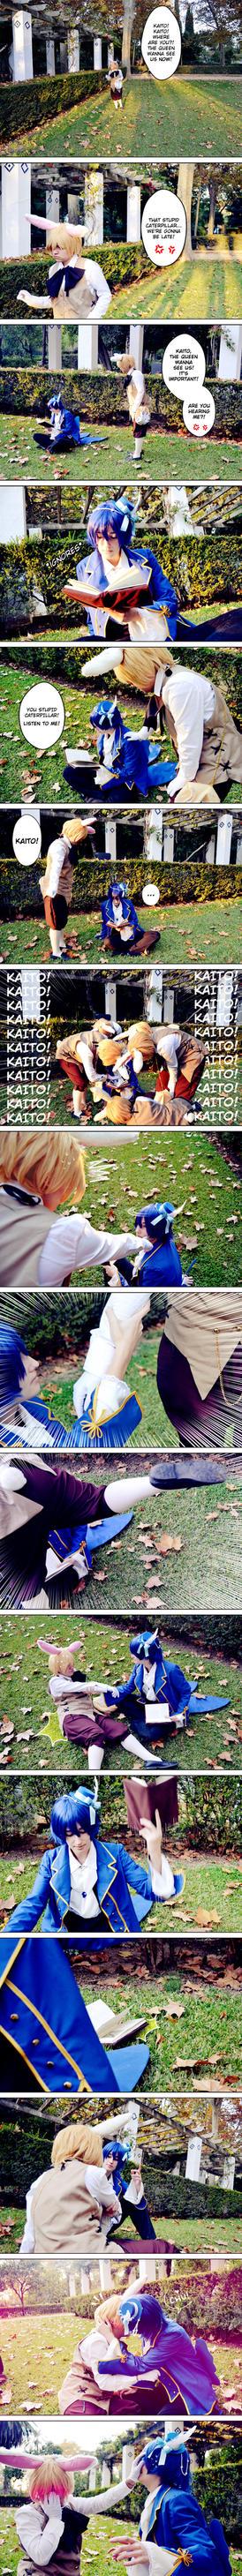 Kaito x Len (Alice in Musicland cosplay) by NarumyNatsue